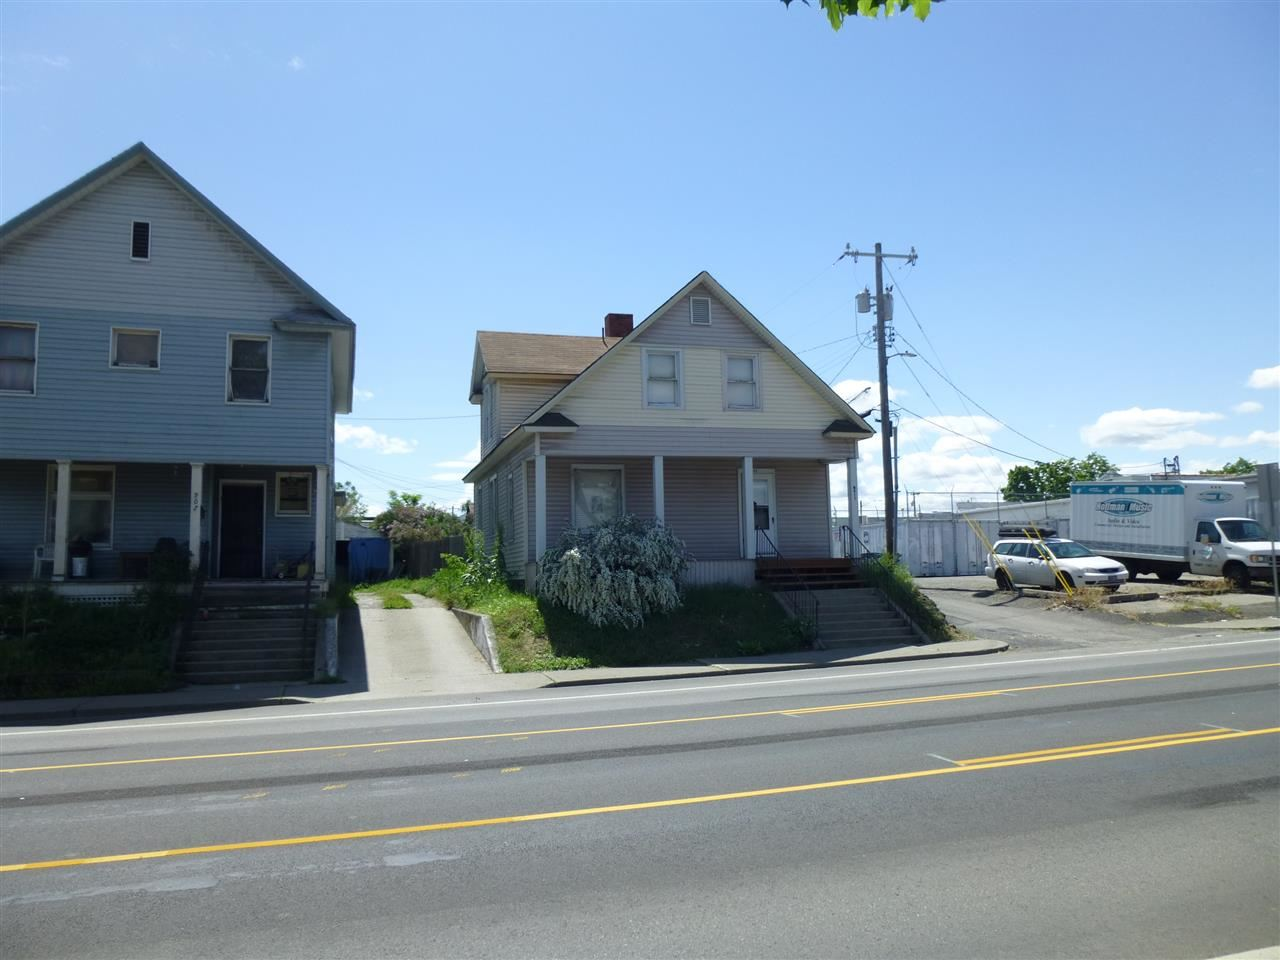 911 W Maxwell Ave, Spokane, WA 99201 - #: 202014951